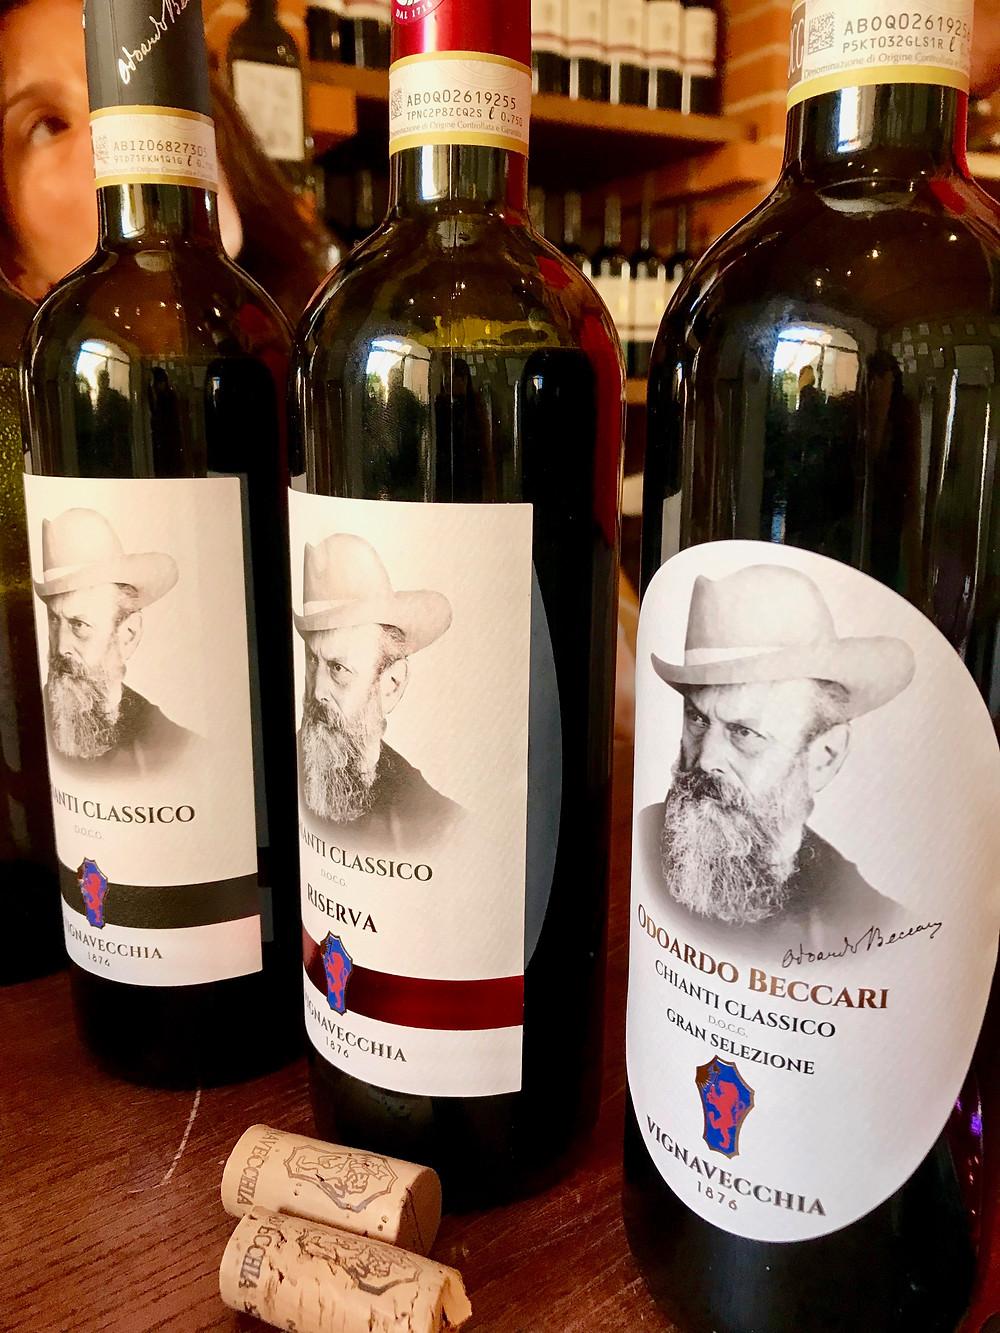 Top Tuscany wines 2019